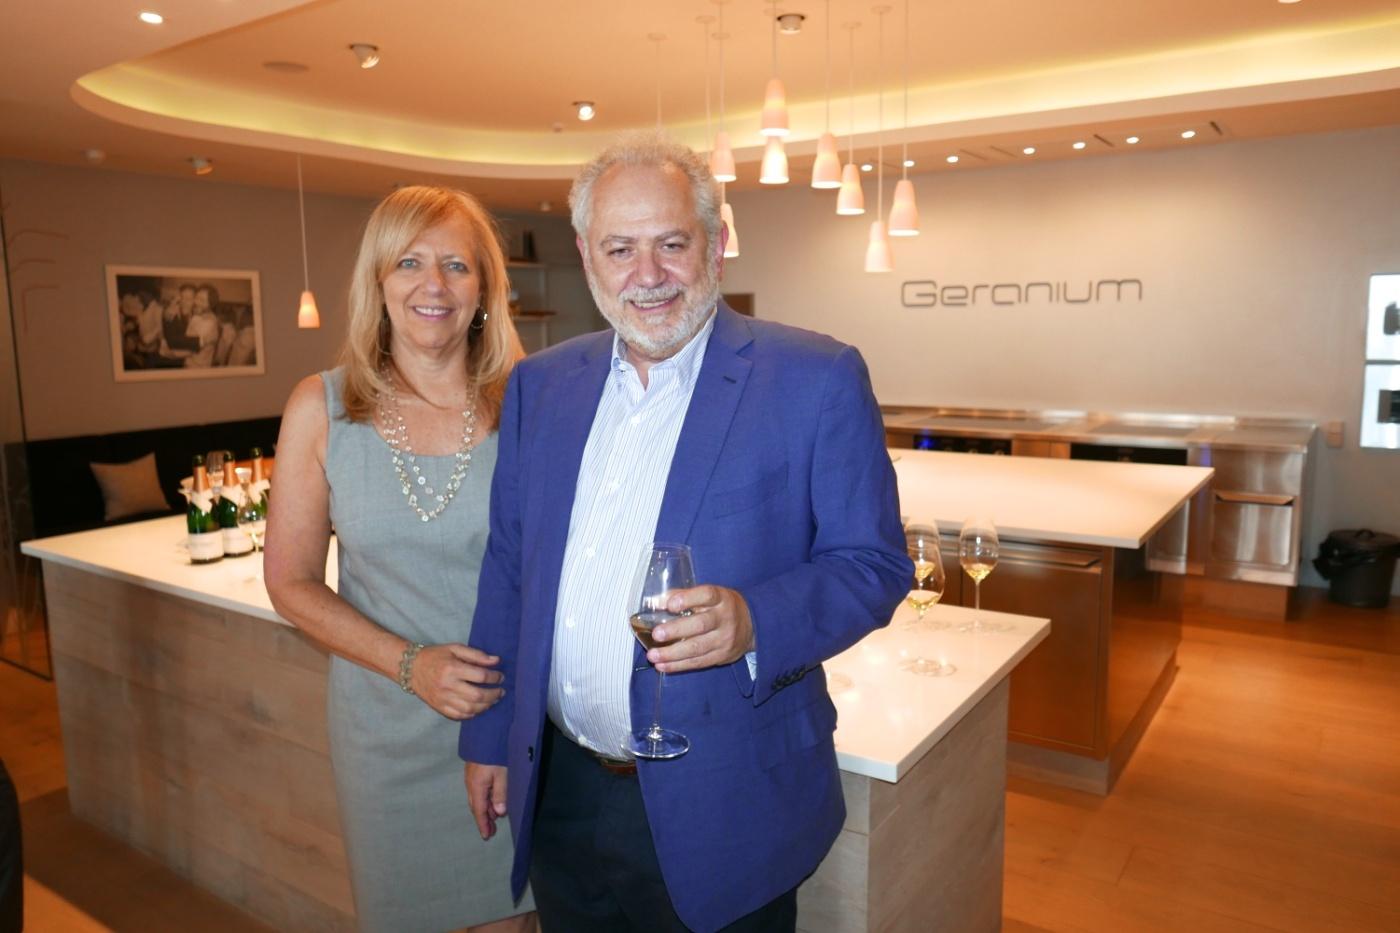 Reception_ OAD Masters Dinner | Geranium | Copenhagen | 05/21/16